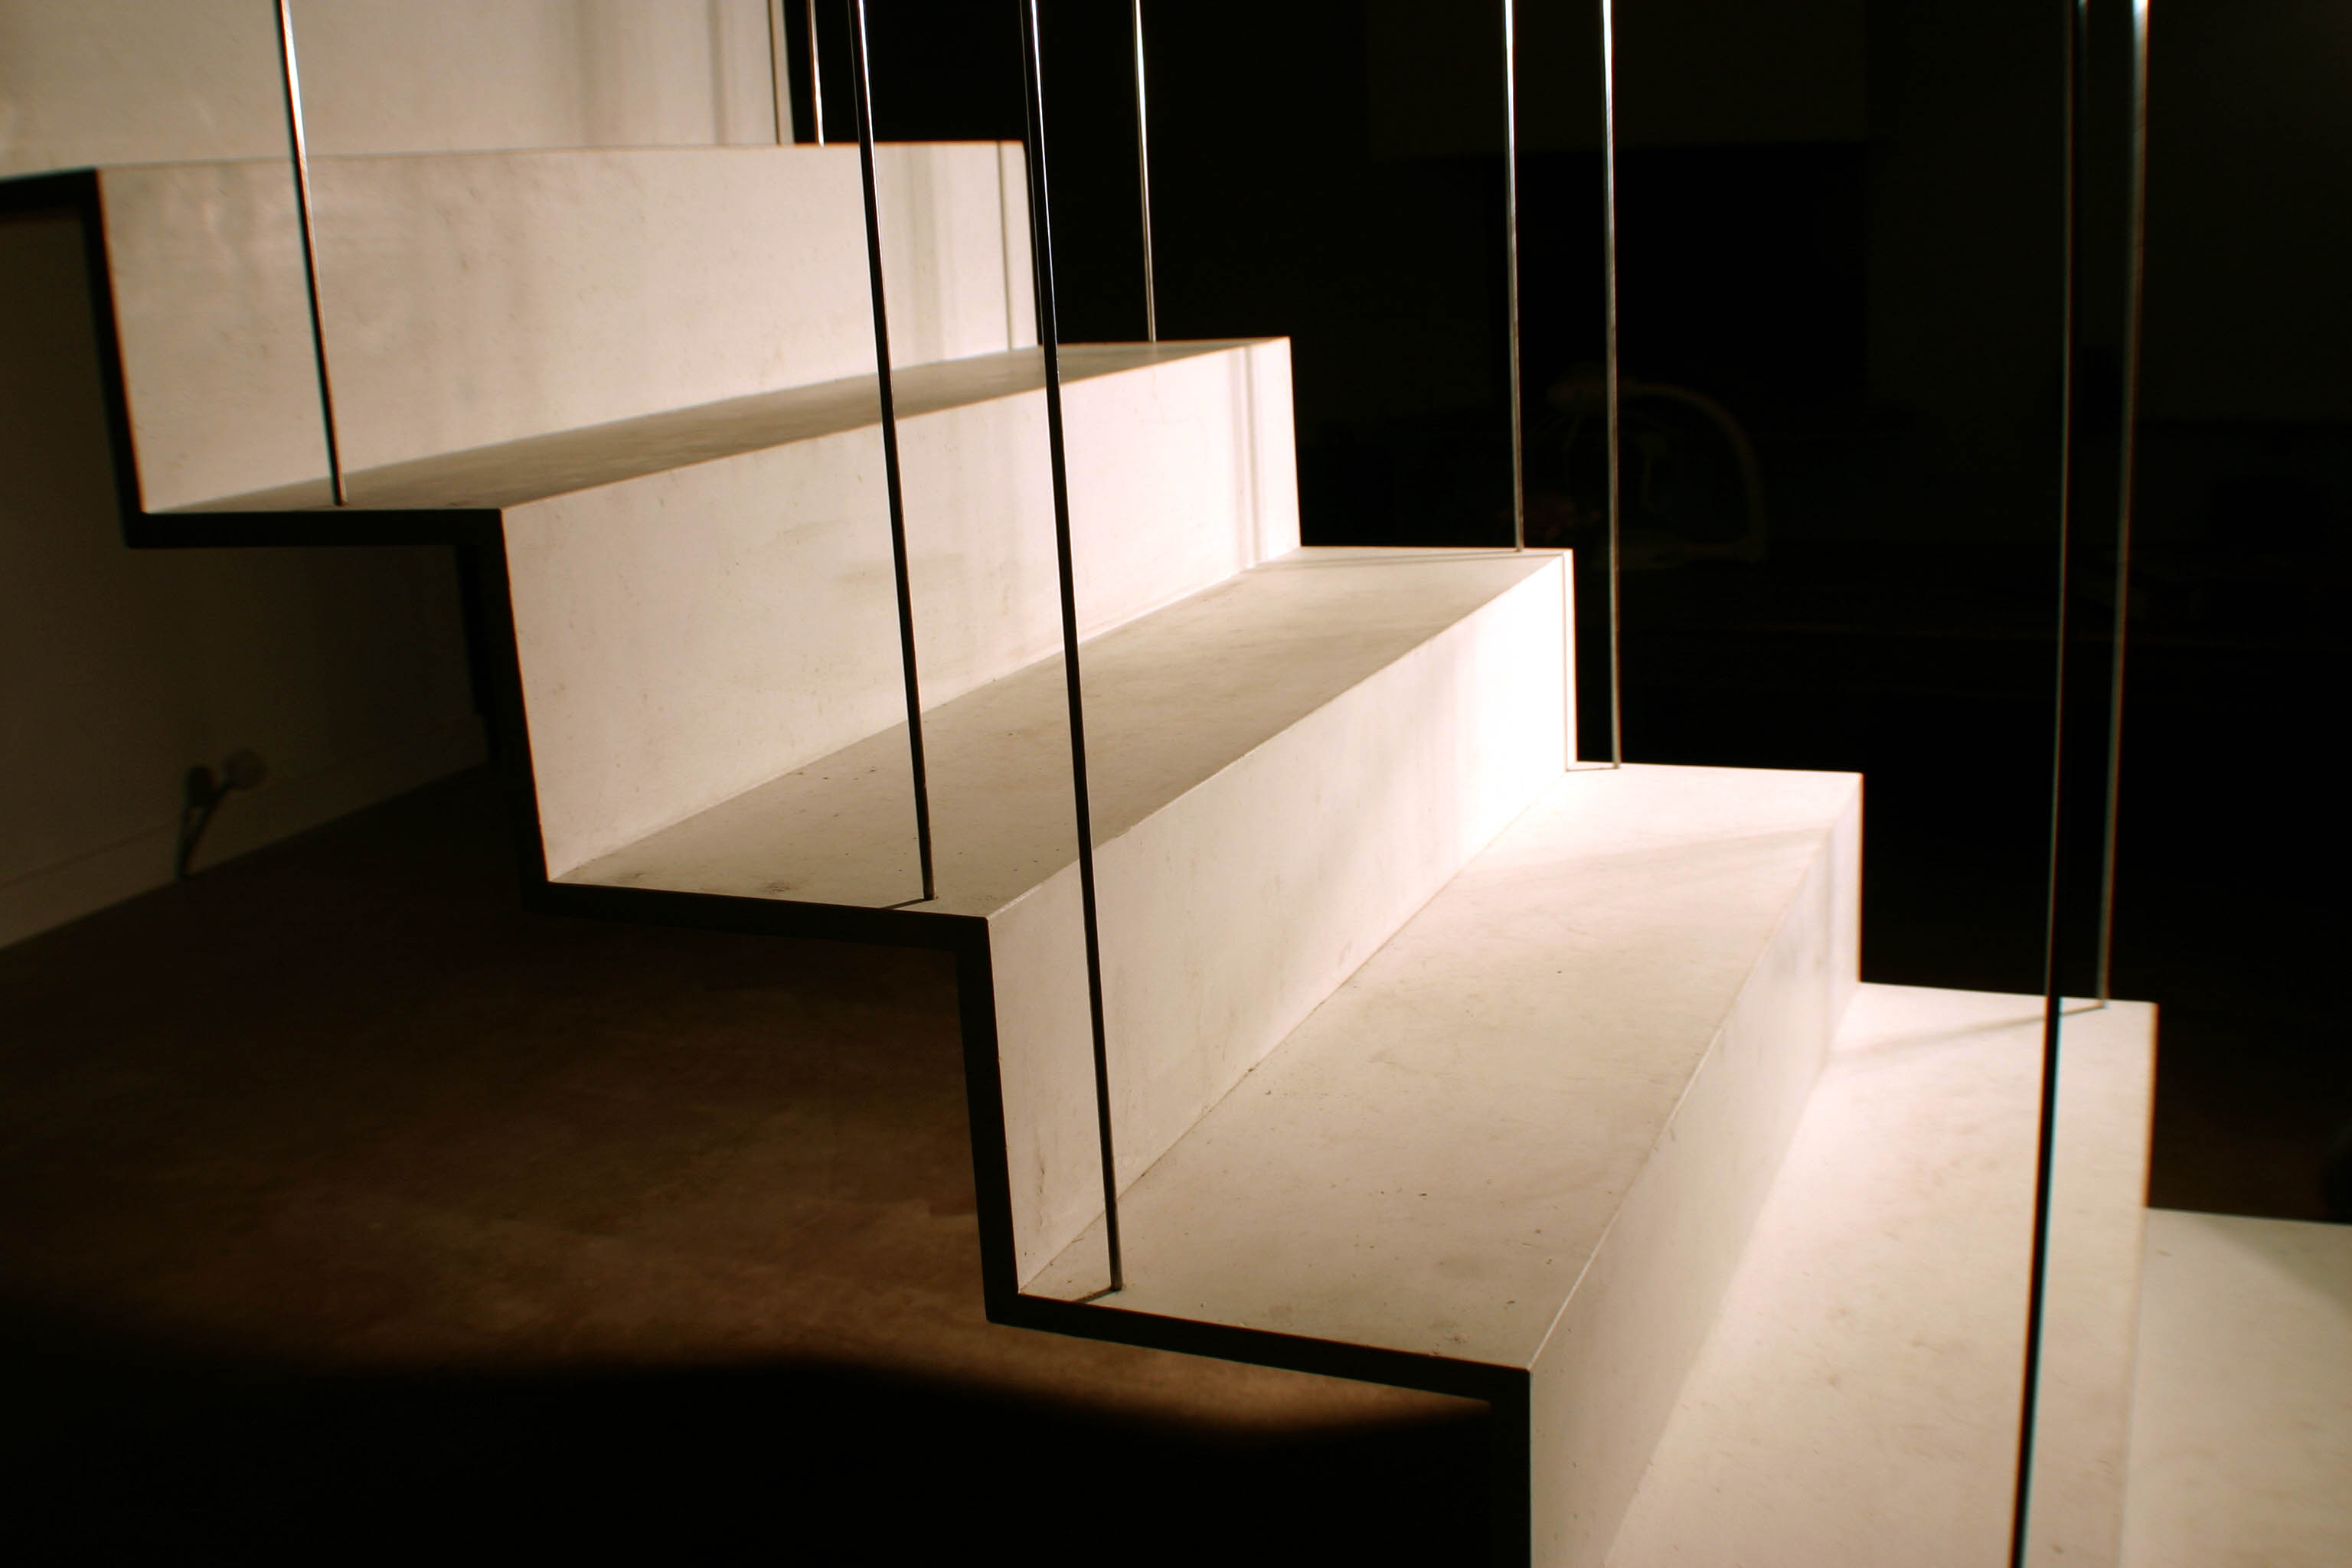 escalier suspendu conjugaison cr ation. Black Bedroom Furniture Sets. Home Design Ideas